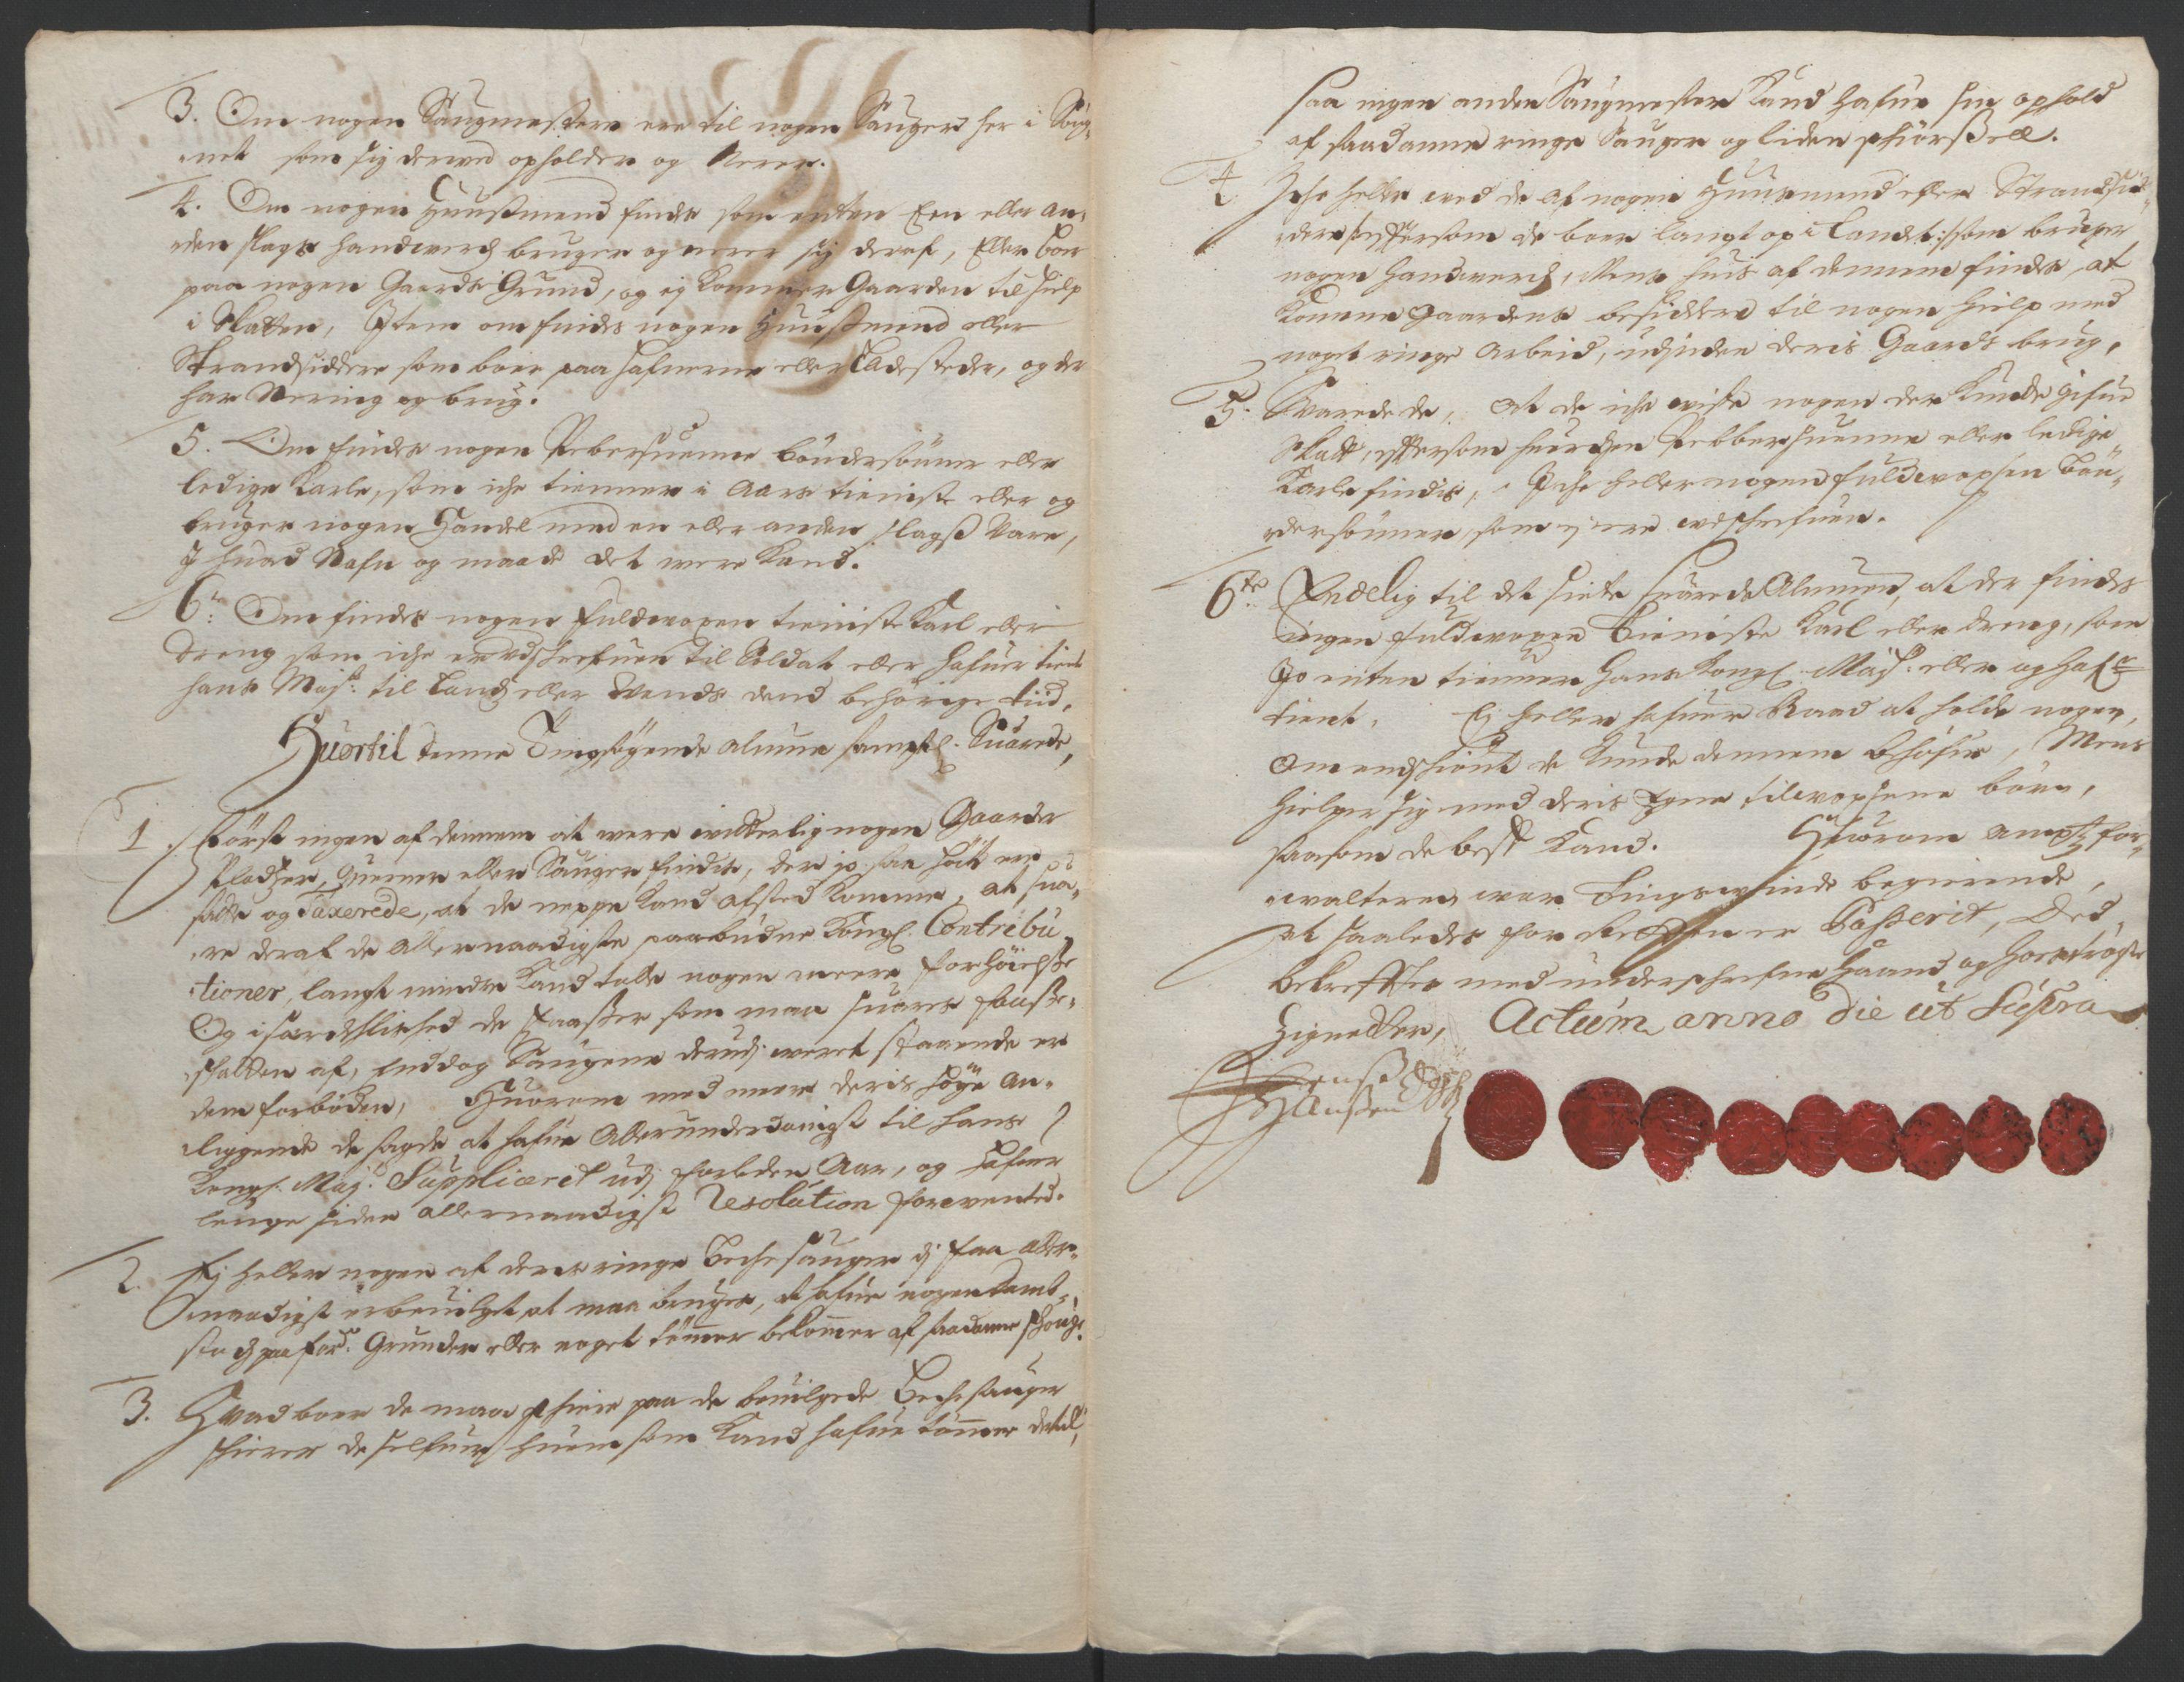 RA, Rentekammeret inntil 1814, Reviderte regnskaper, Fogderegnskap, R32/L1864: Fogderegnskap Jarlsberg grevskap, 1691, s. 446